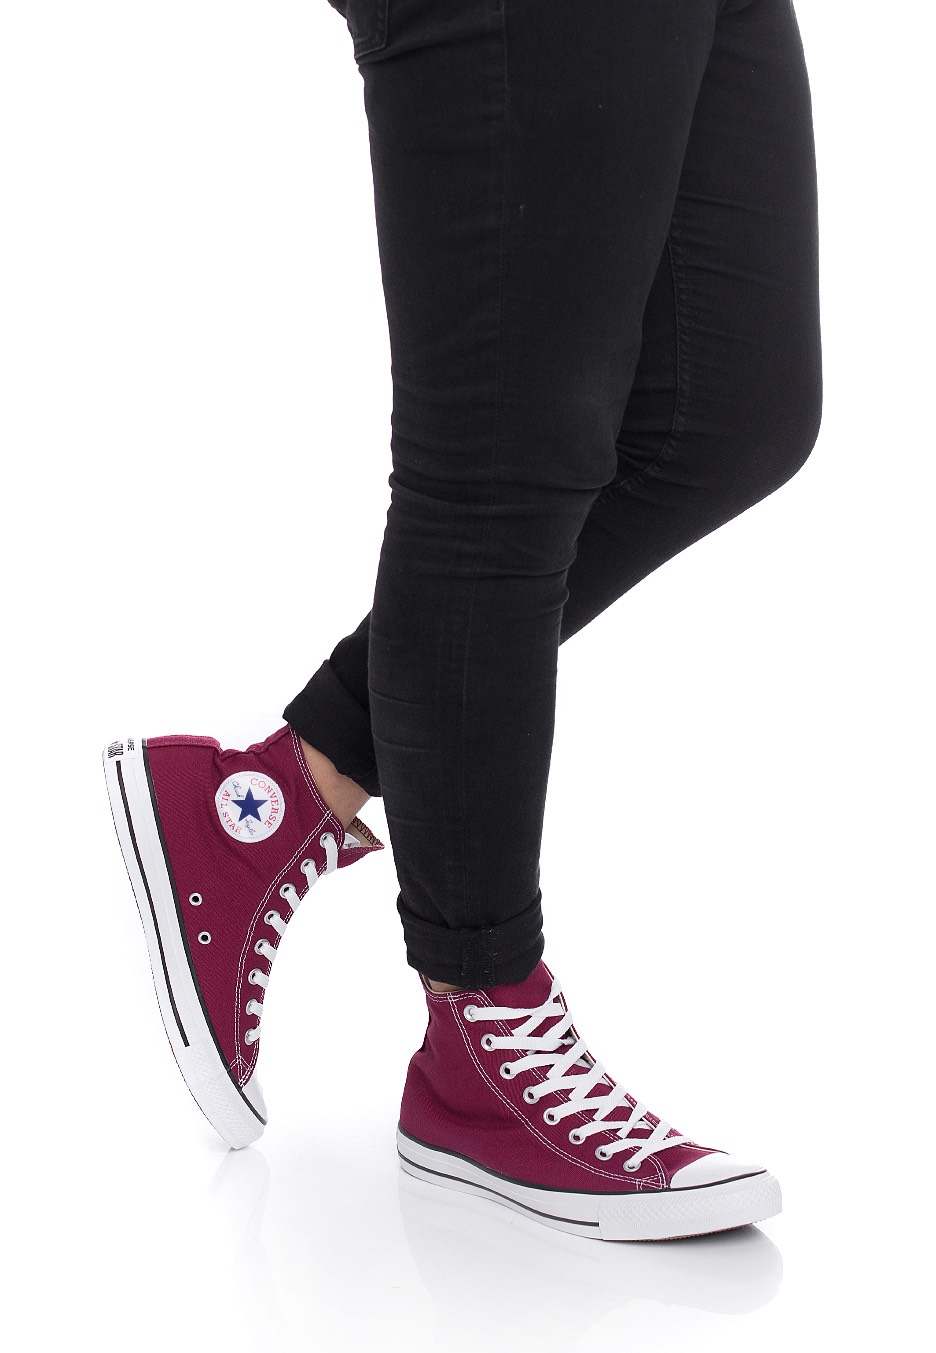 b41f230c4dcb73 29858 8e2e4  buy converse chuck taylor all star hi maroon shoes cffa1 079b8